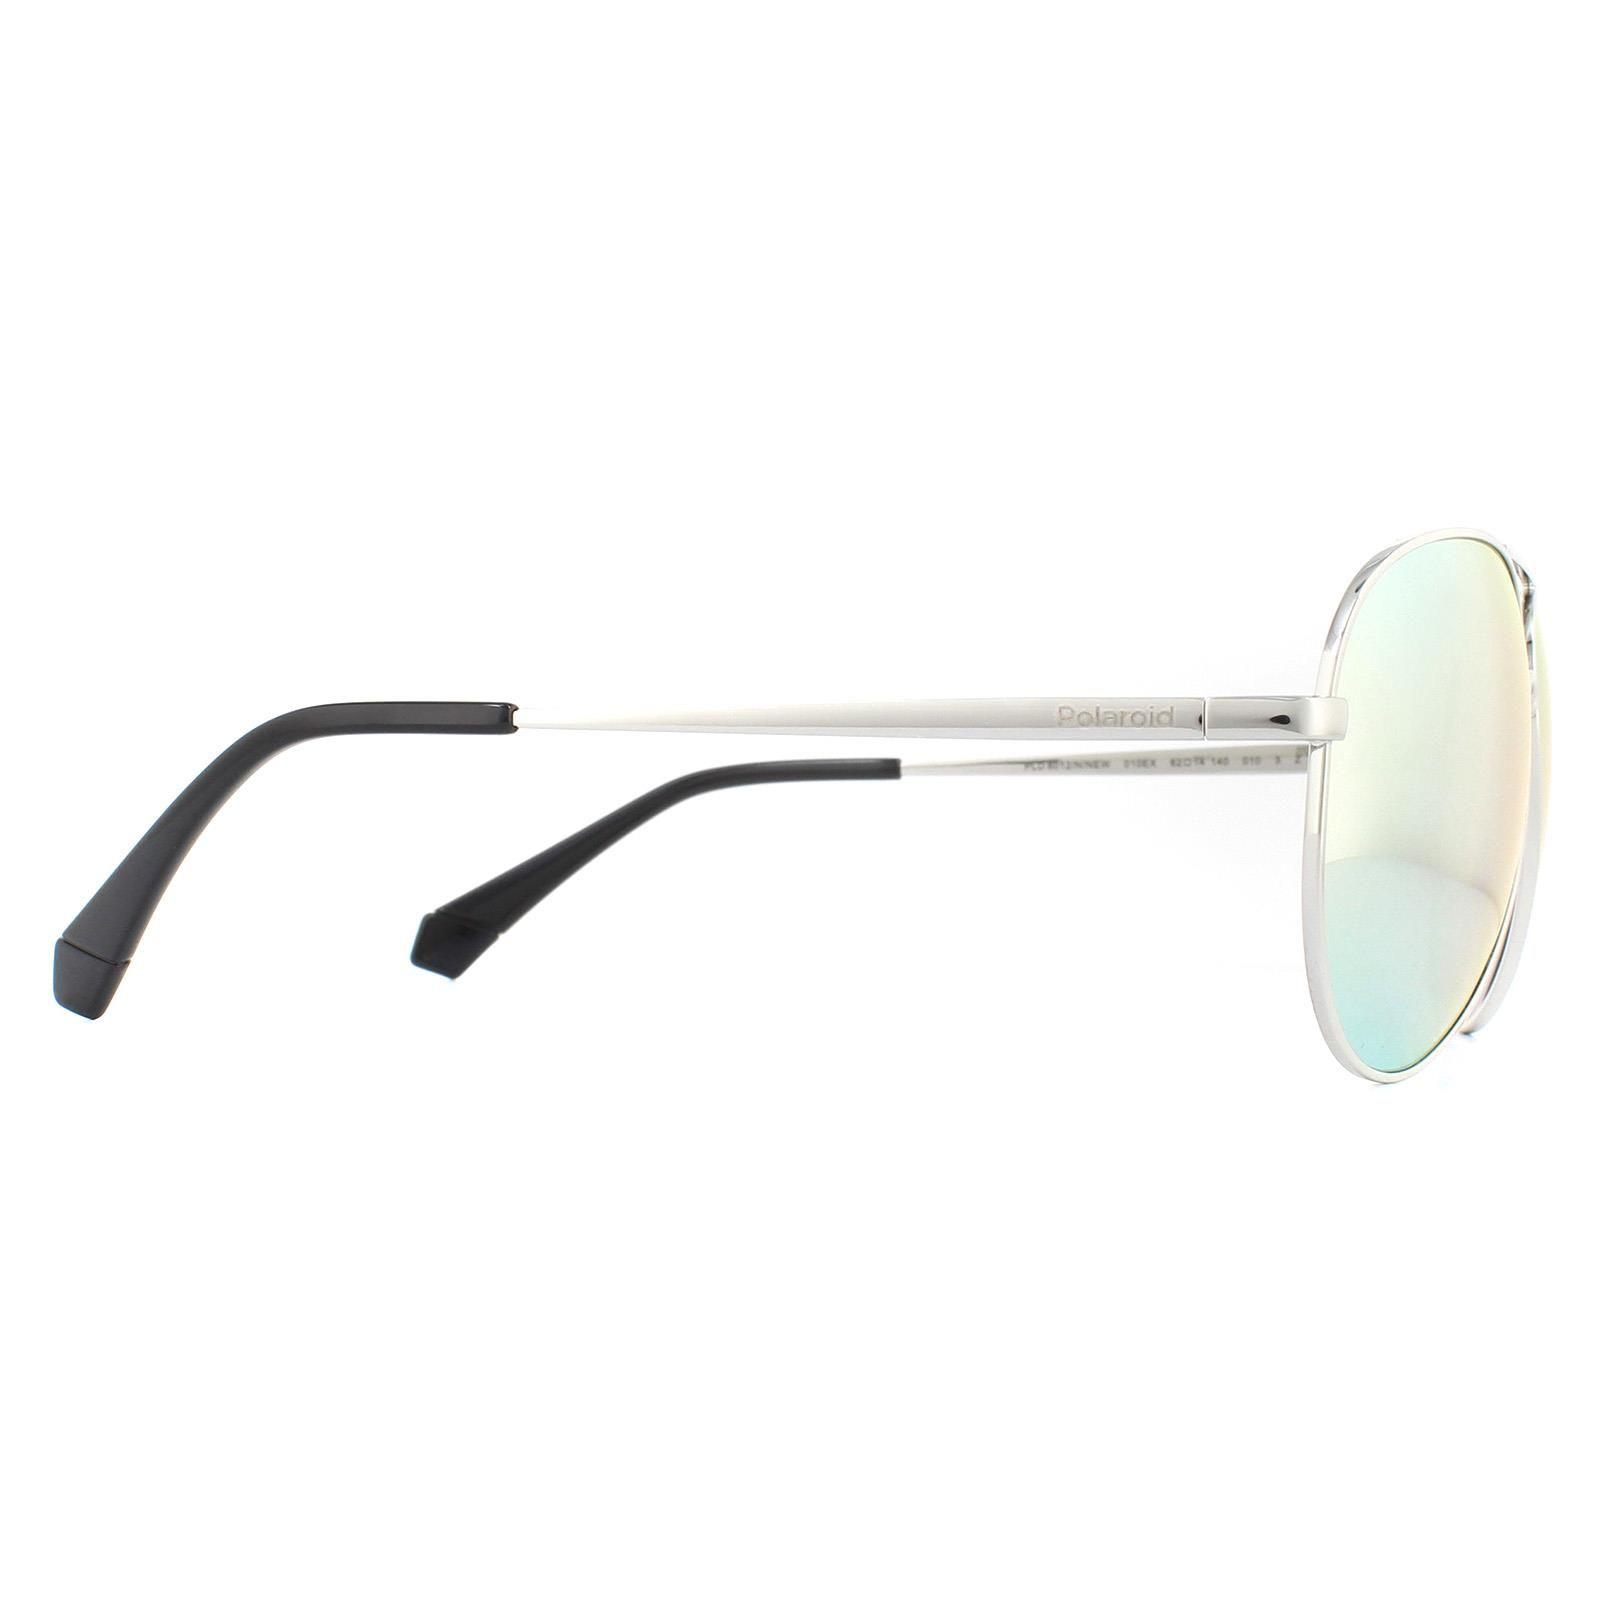 Polaroid Sunglasses 6012/N/NEW 010 EX Palladium Grey Silver Mirror Polarized